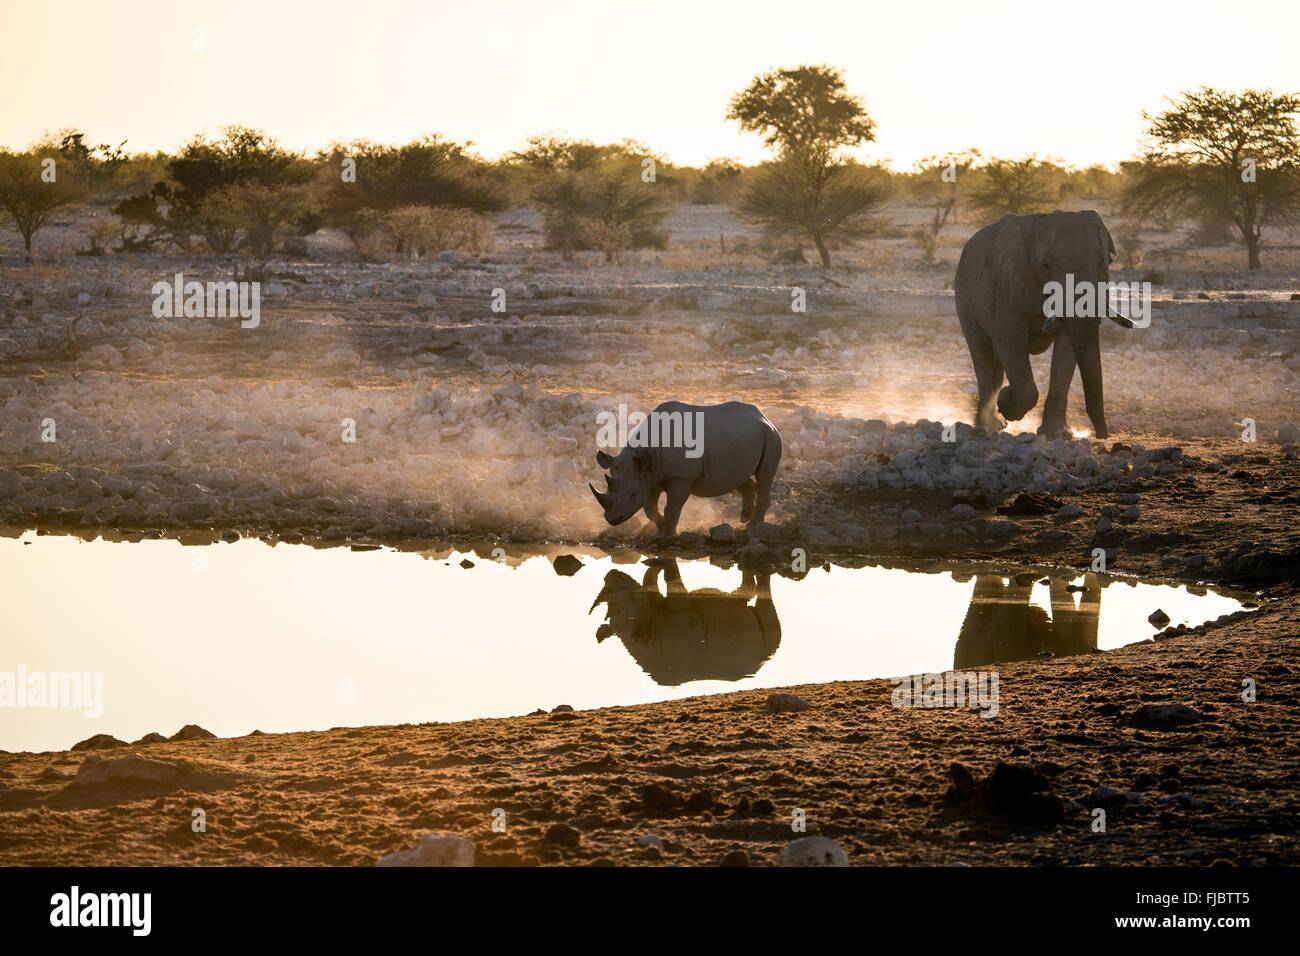 Rhino et un éléphant Photo Stock